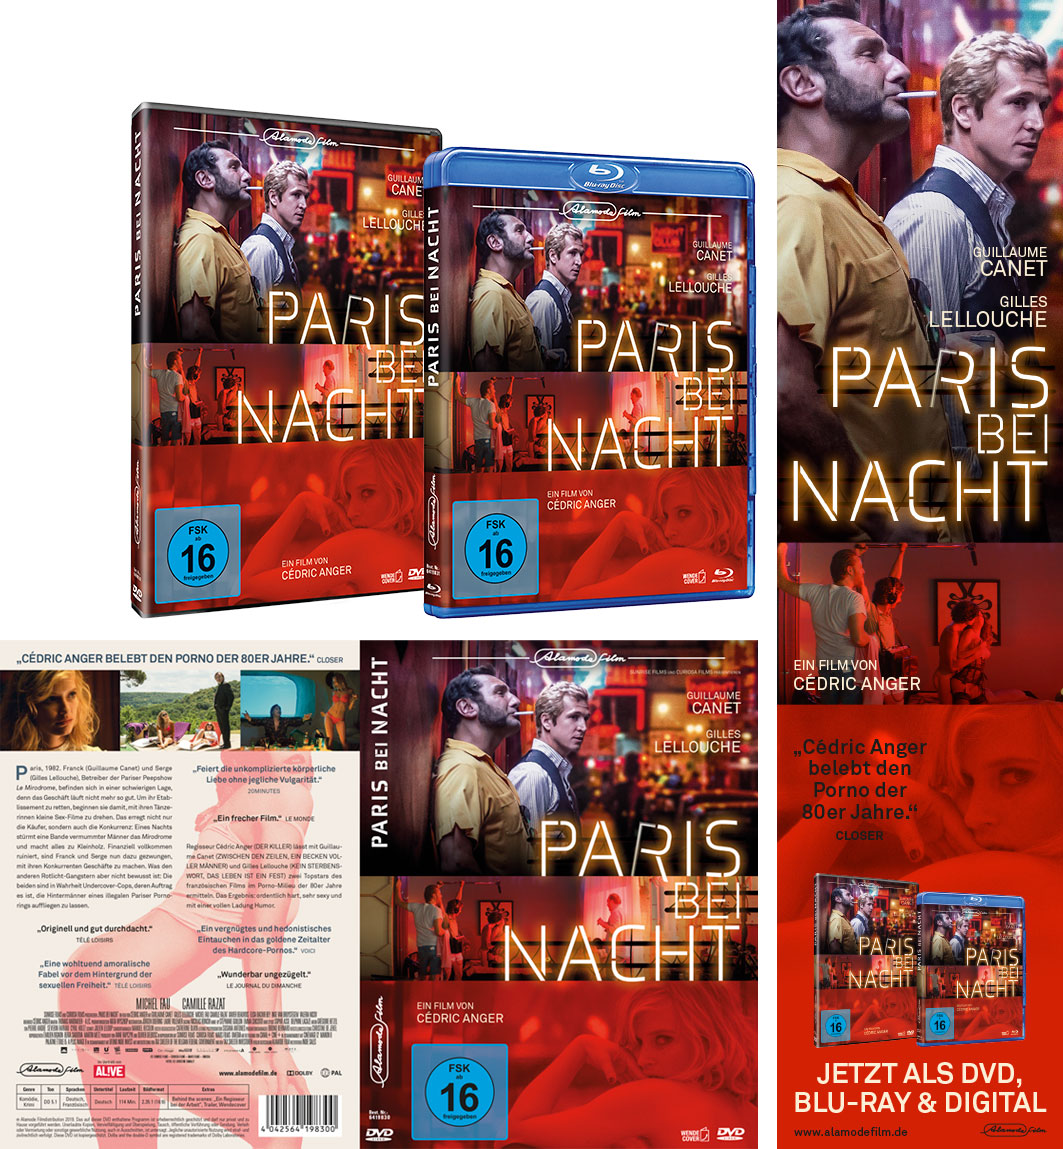 Paris bei Nacht, Alamode, Kinowerbung Grafikdesign